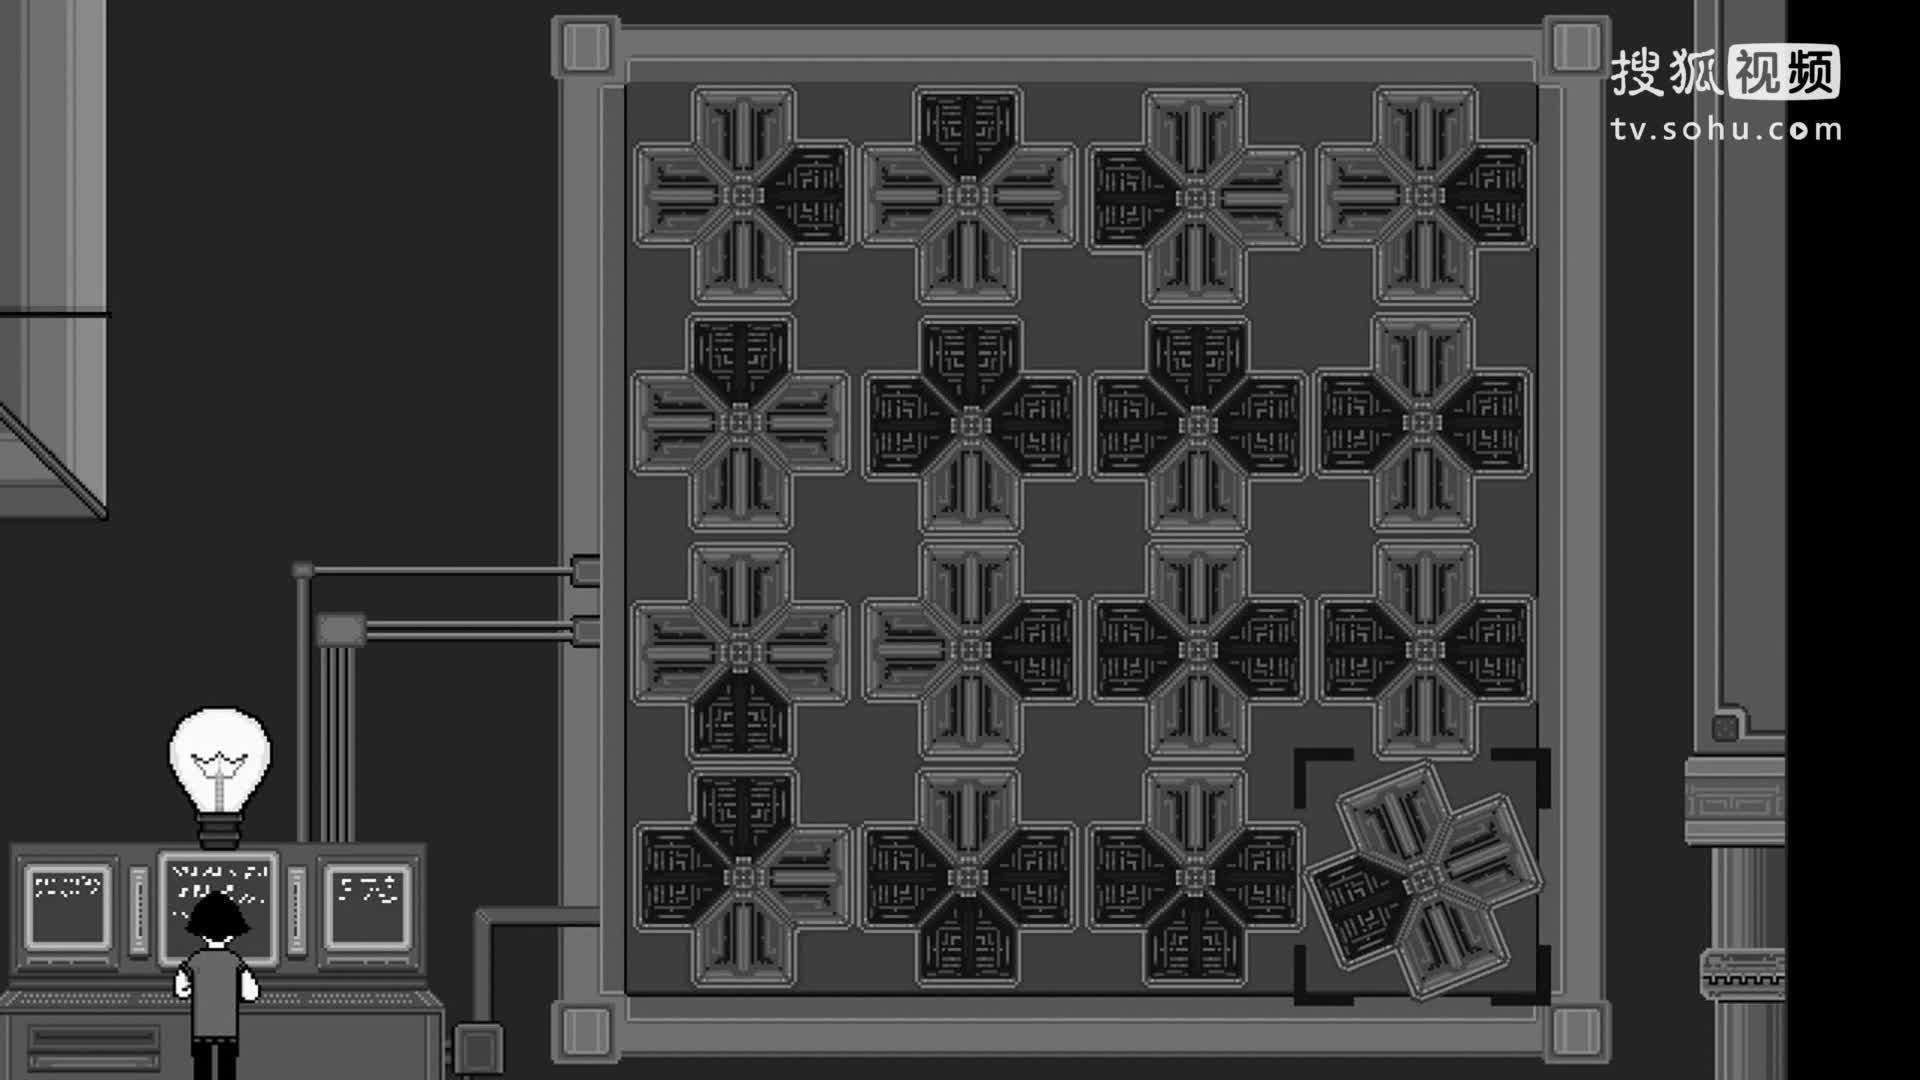 1920x1080高清壁纸电路